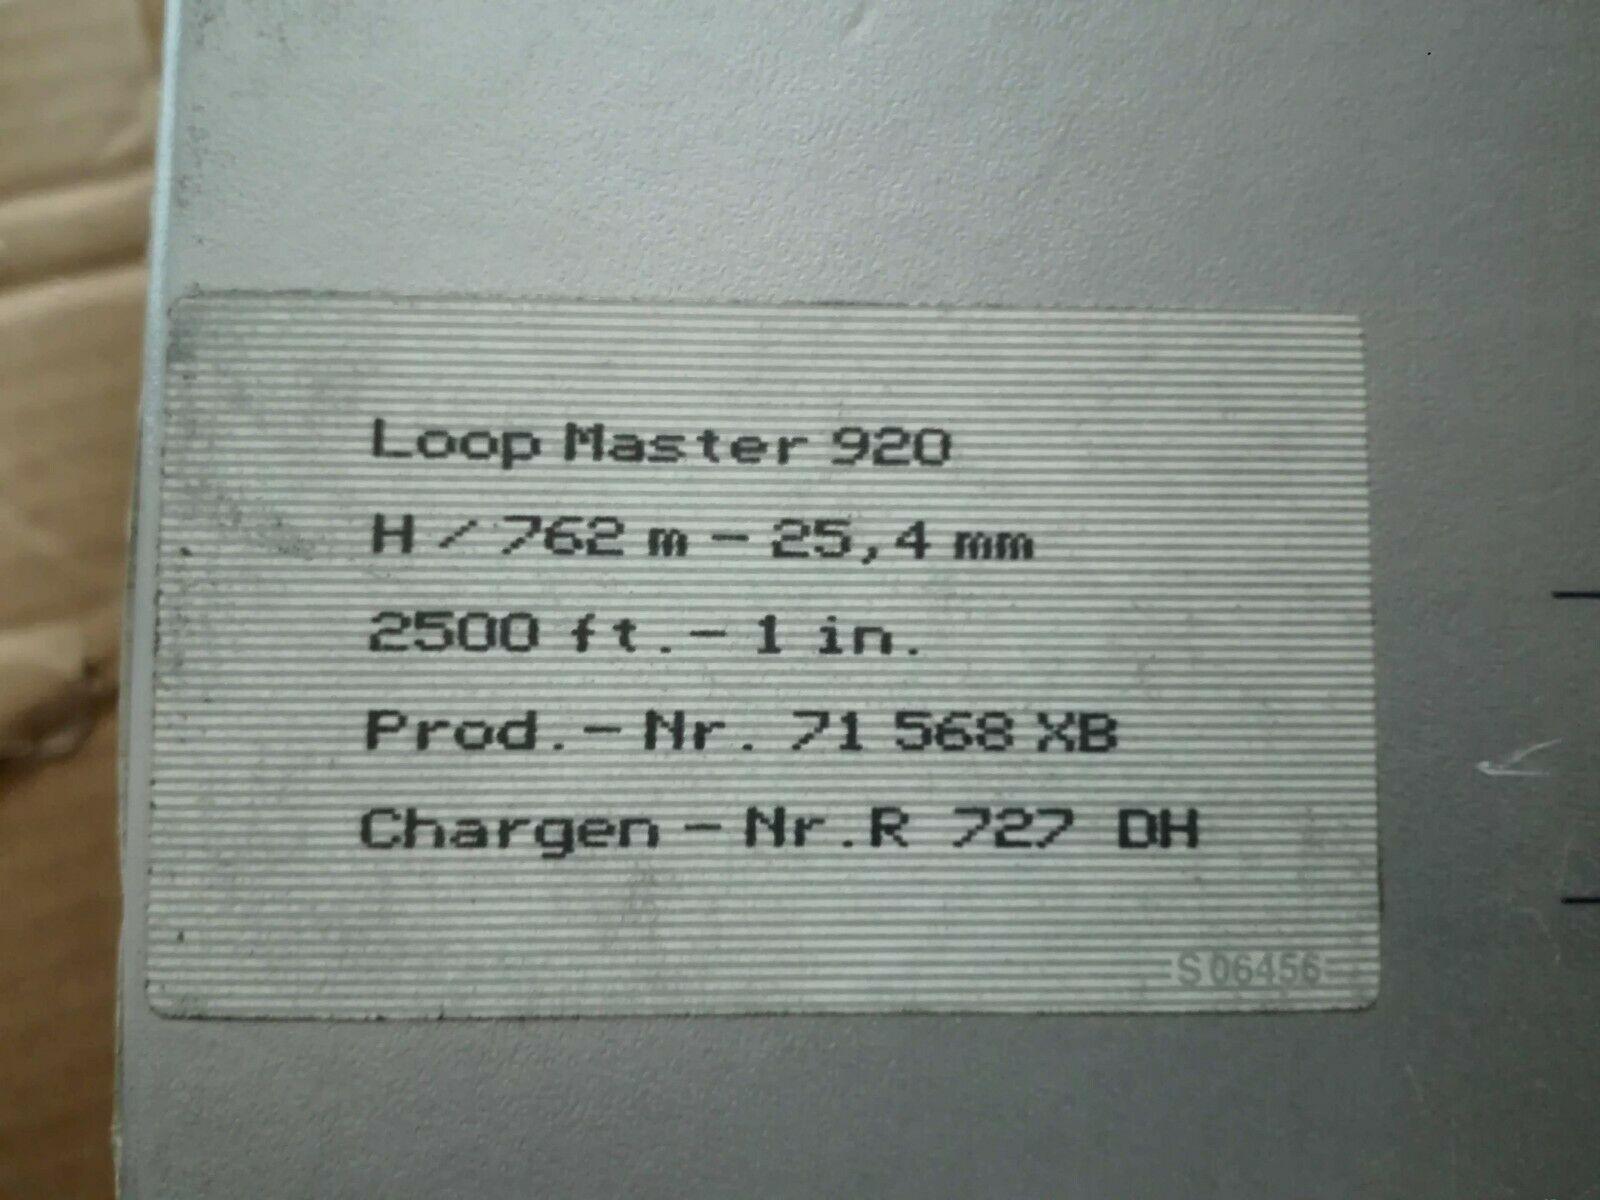 "NOS New Old Stock BASF Loop Master 920 1"" Studio Chrome Reel Tape ULTRA RARE!!!"